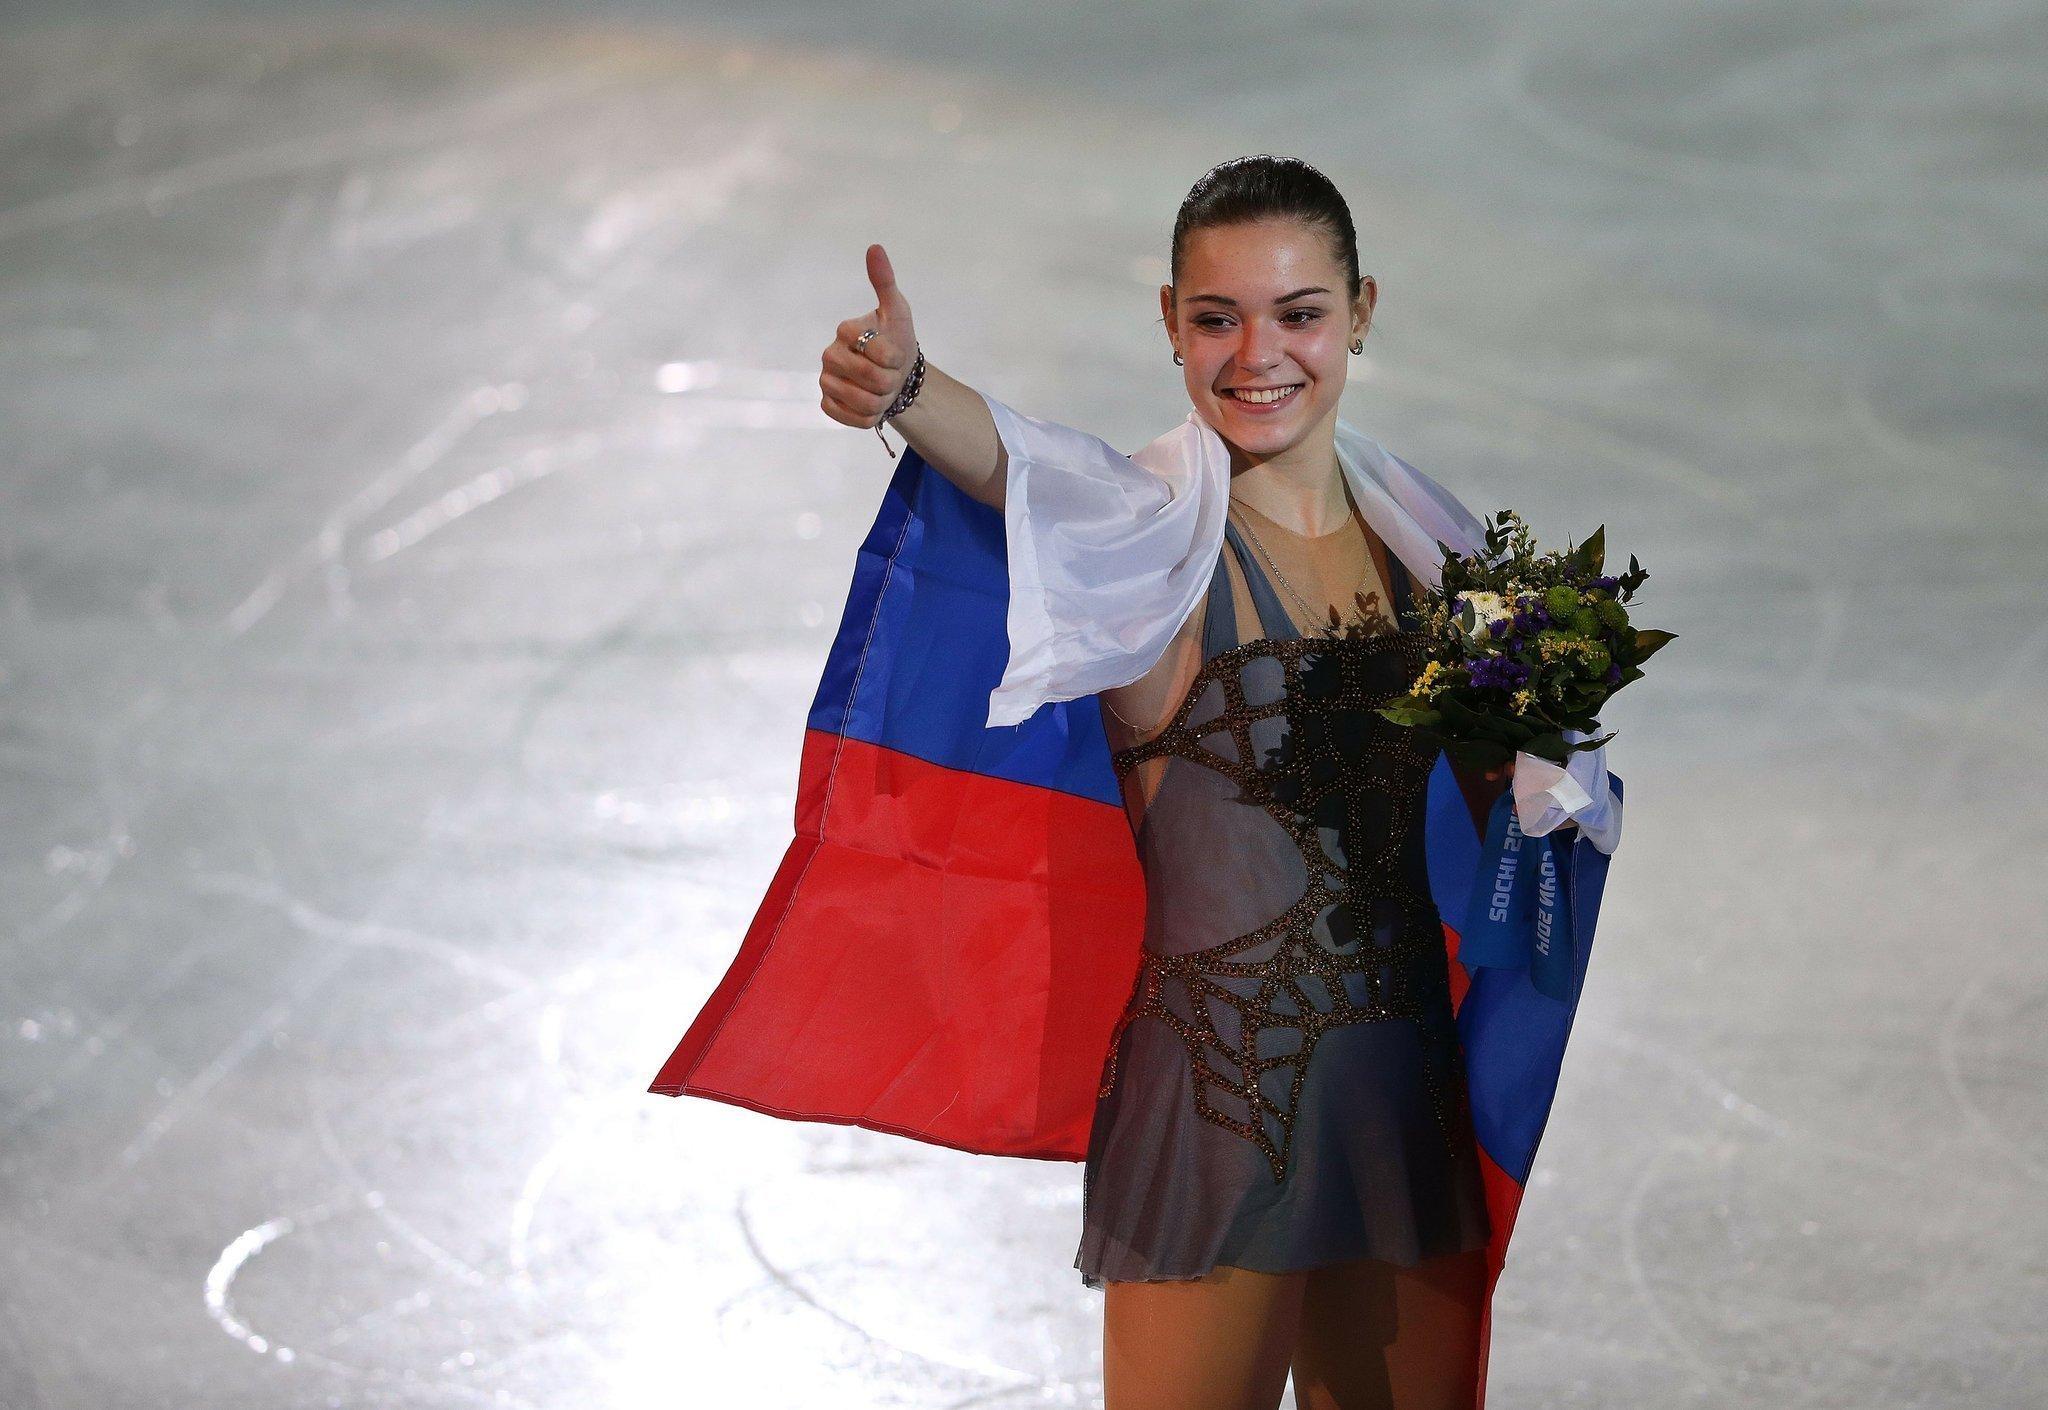 Does Sotnikova deserve skating gold?